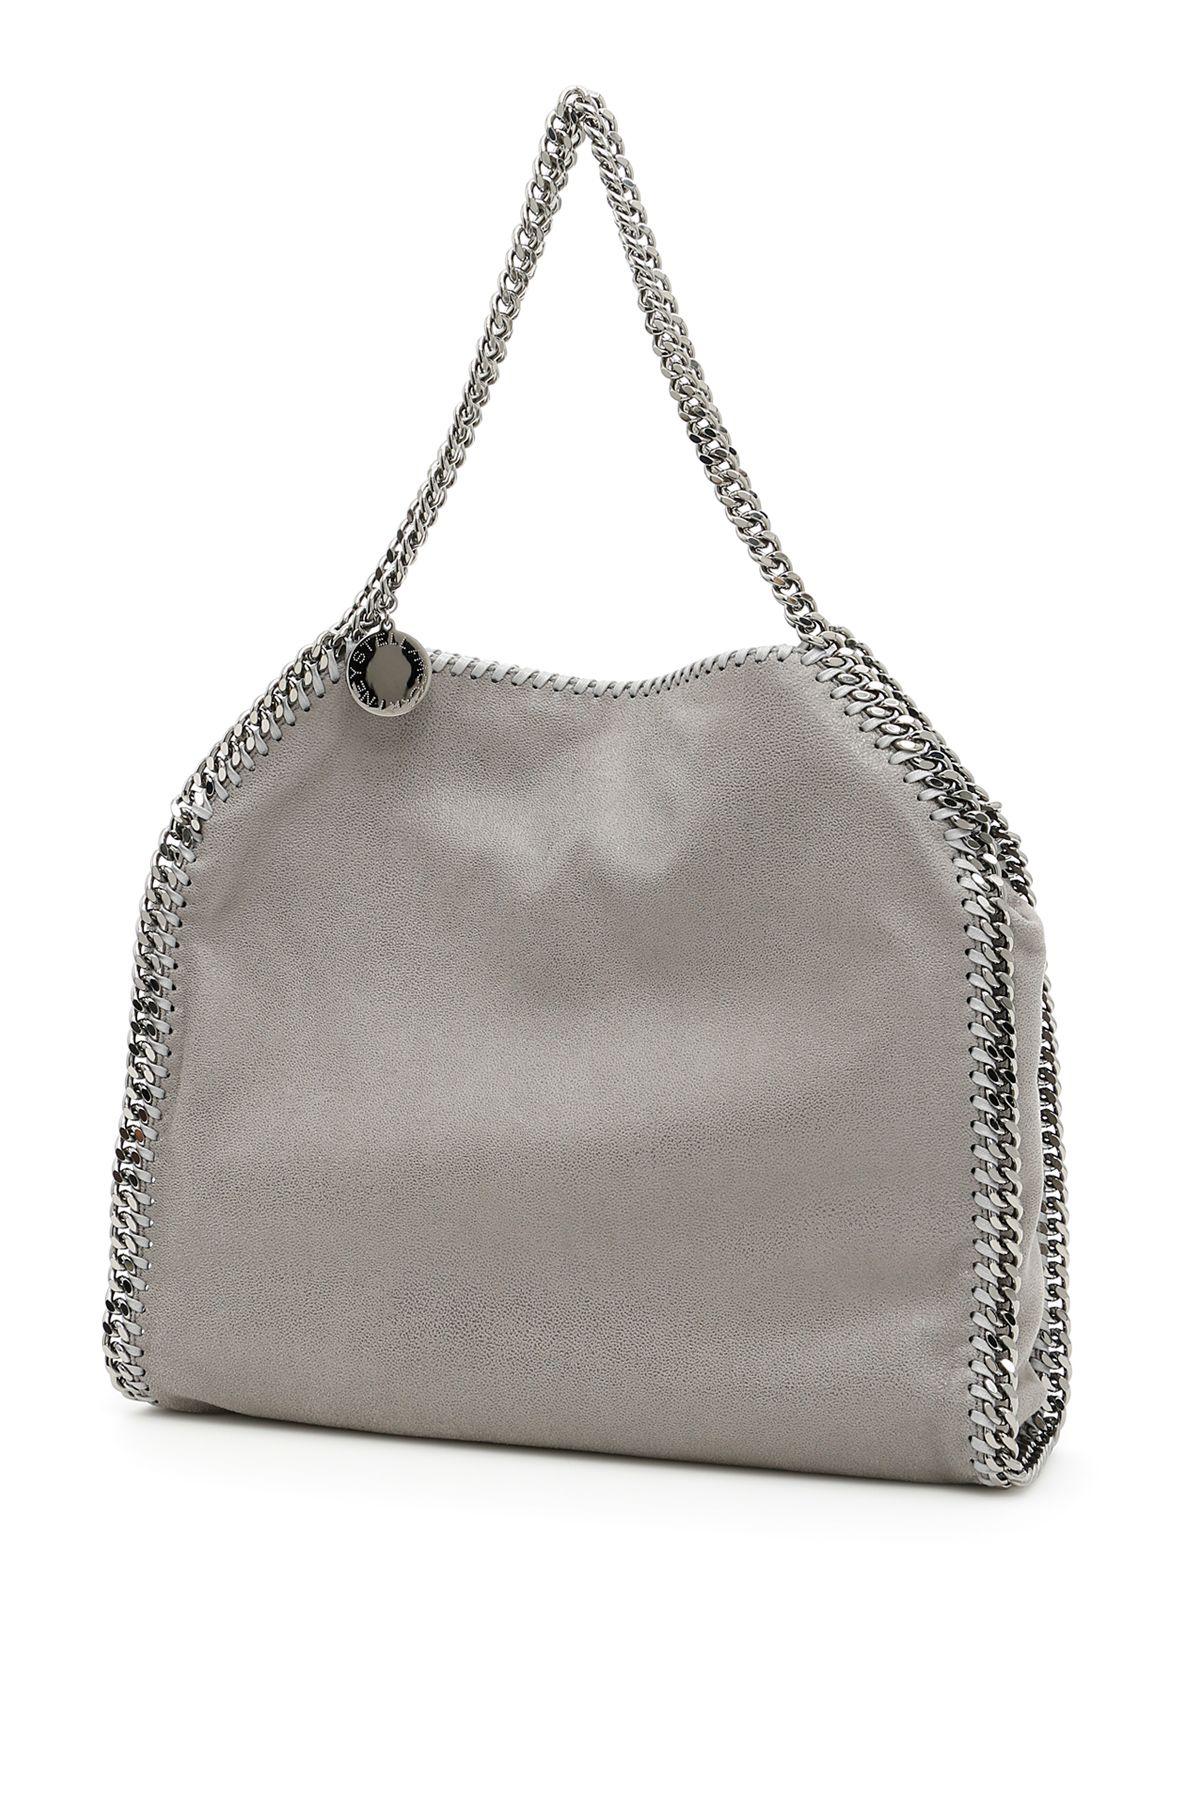 Stella McCartney Stella McCartney Small Falabella Tote Bag - LIGHT ... ed2955ff7ffa3